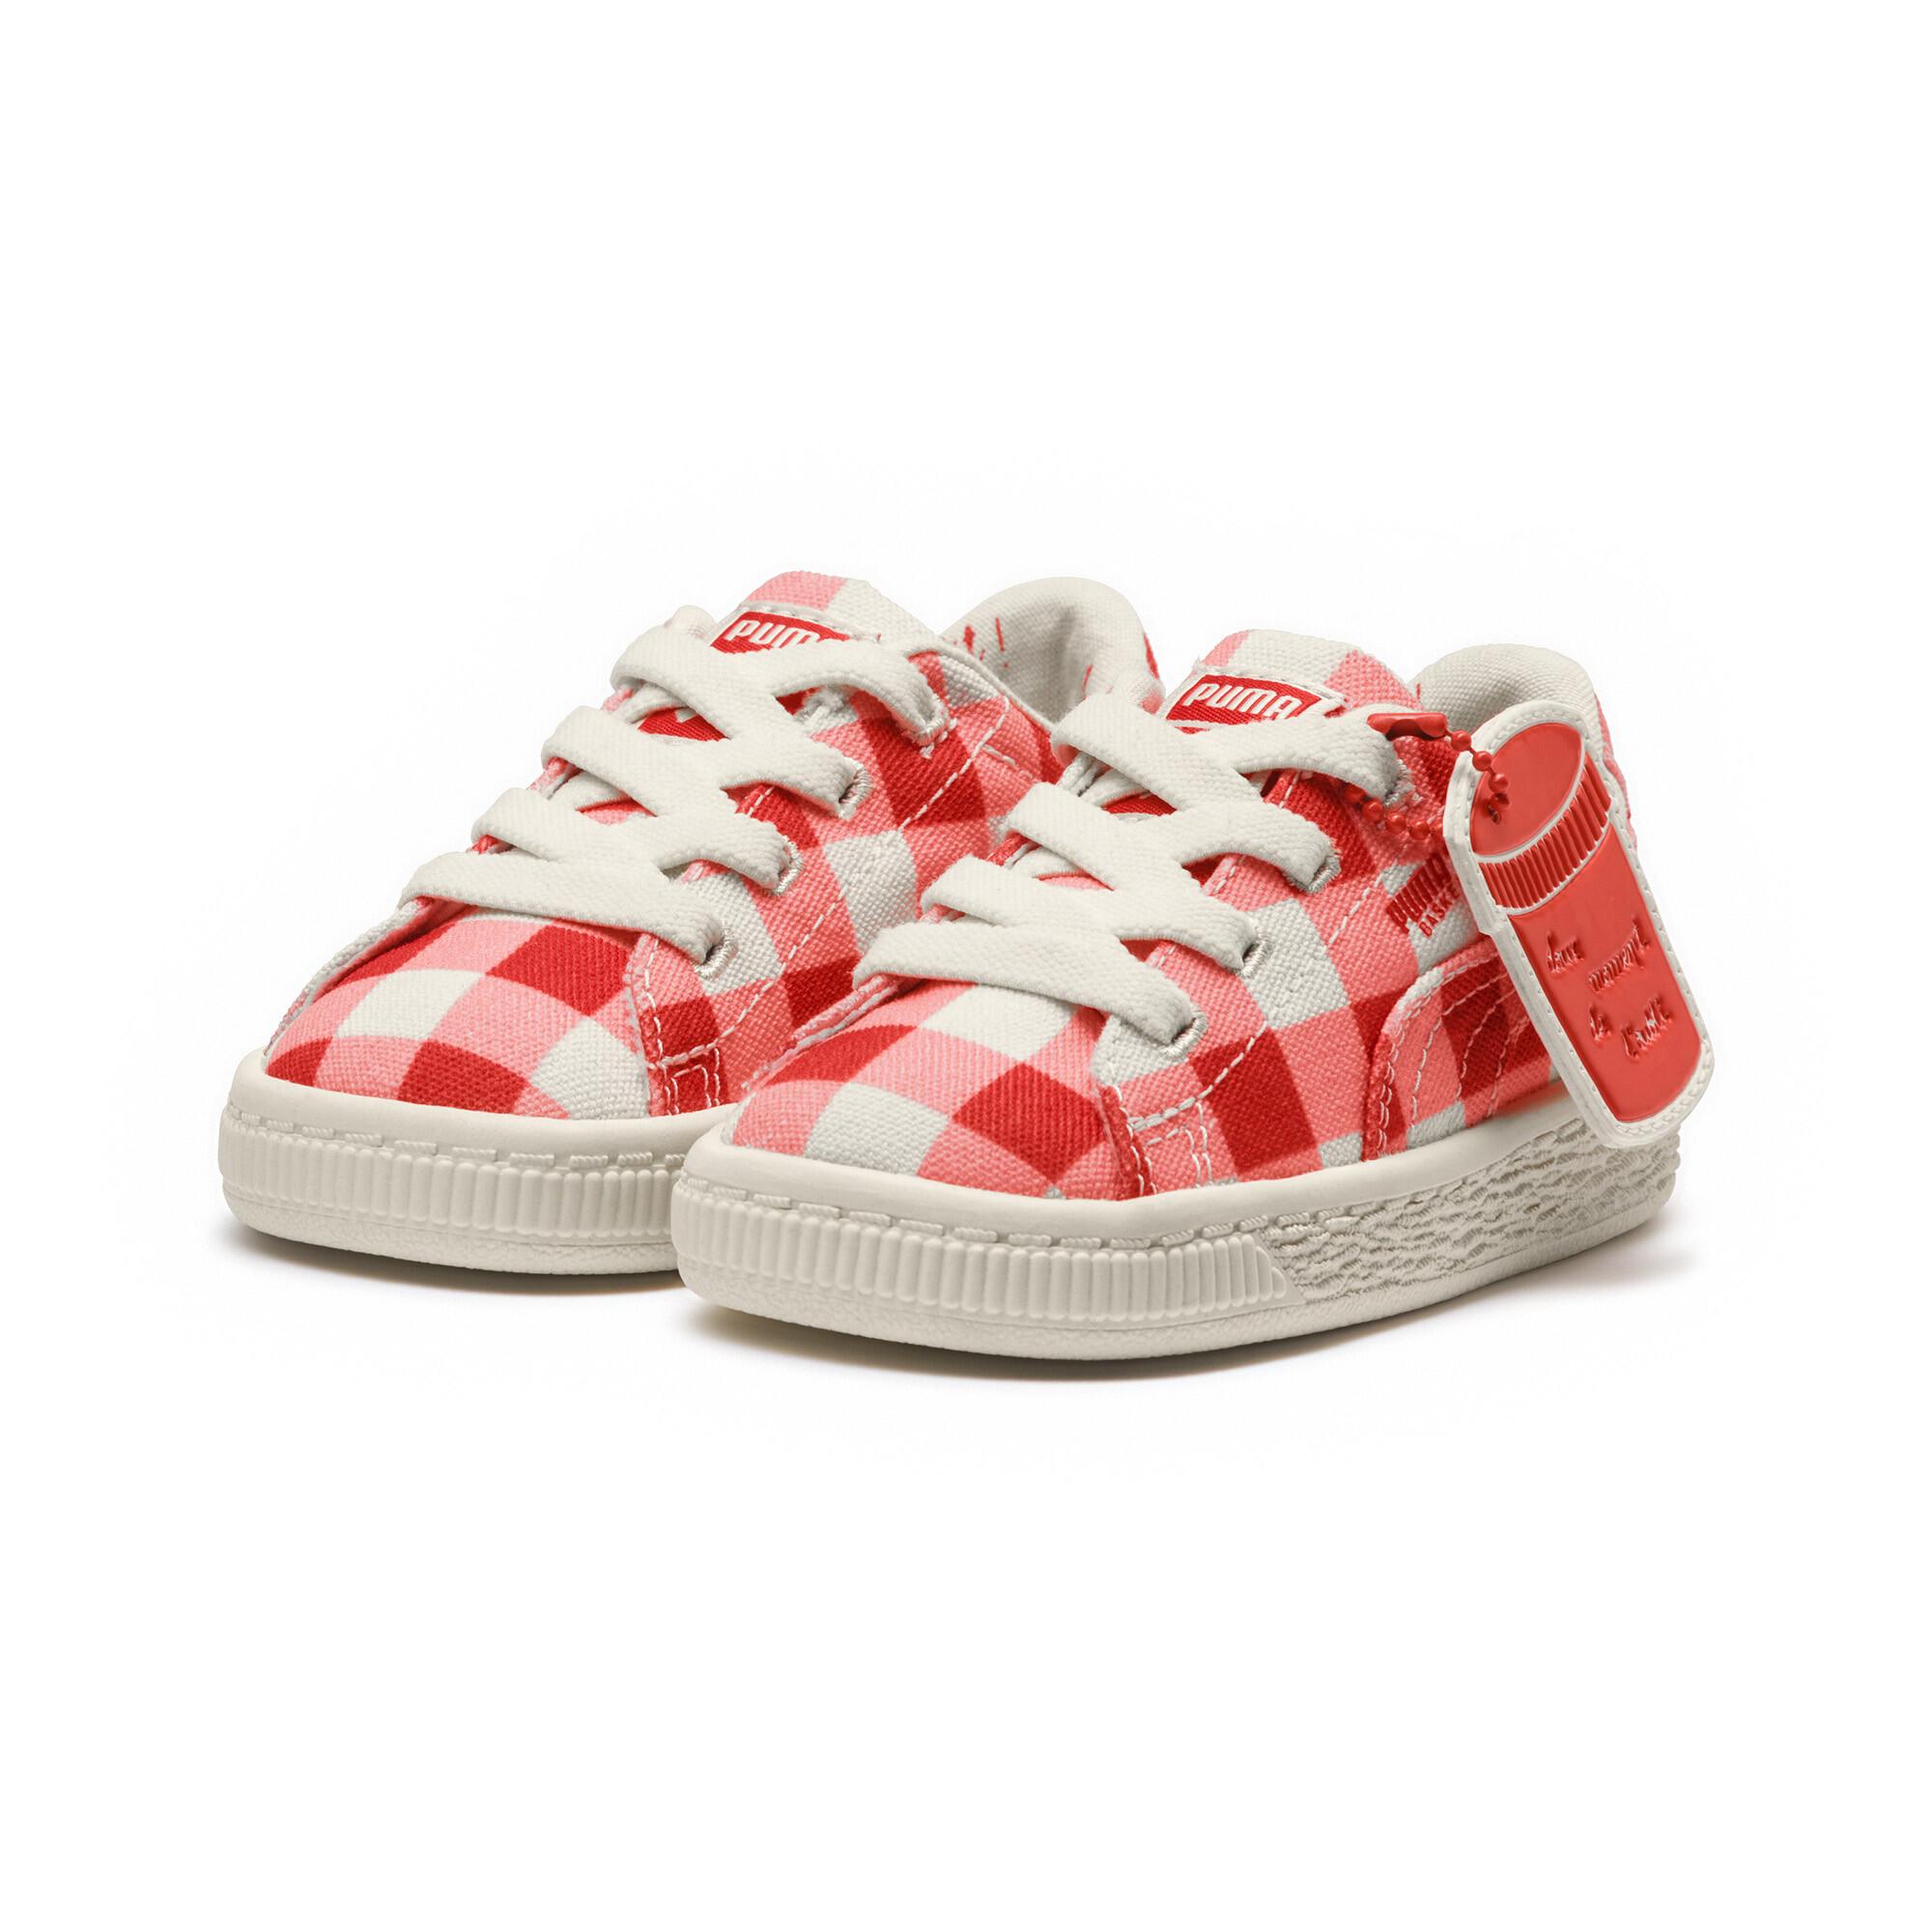 Image Puma PUMA x TINYCOTTONS Kids' Pre School Basket Sneakers #2